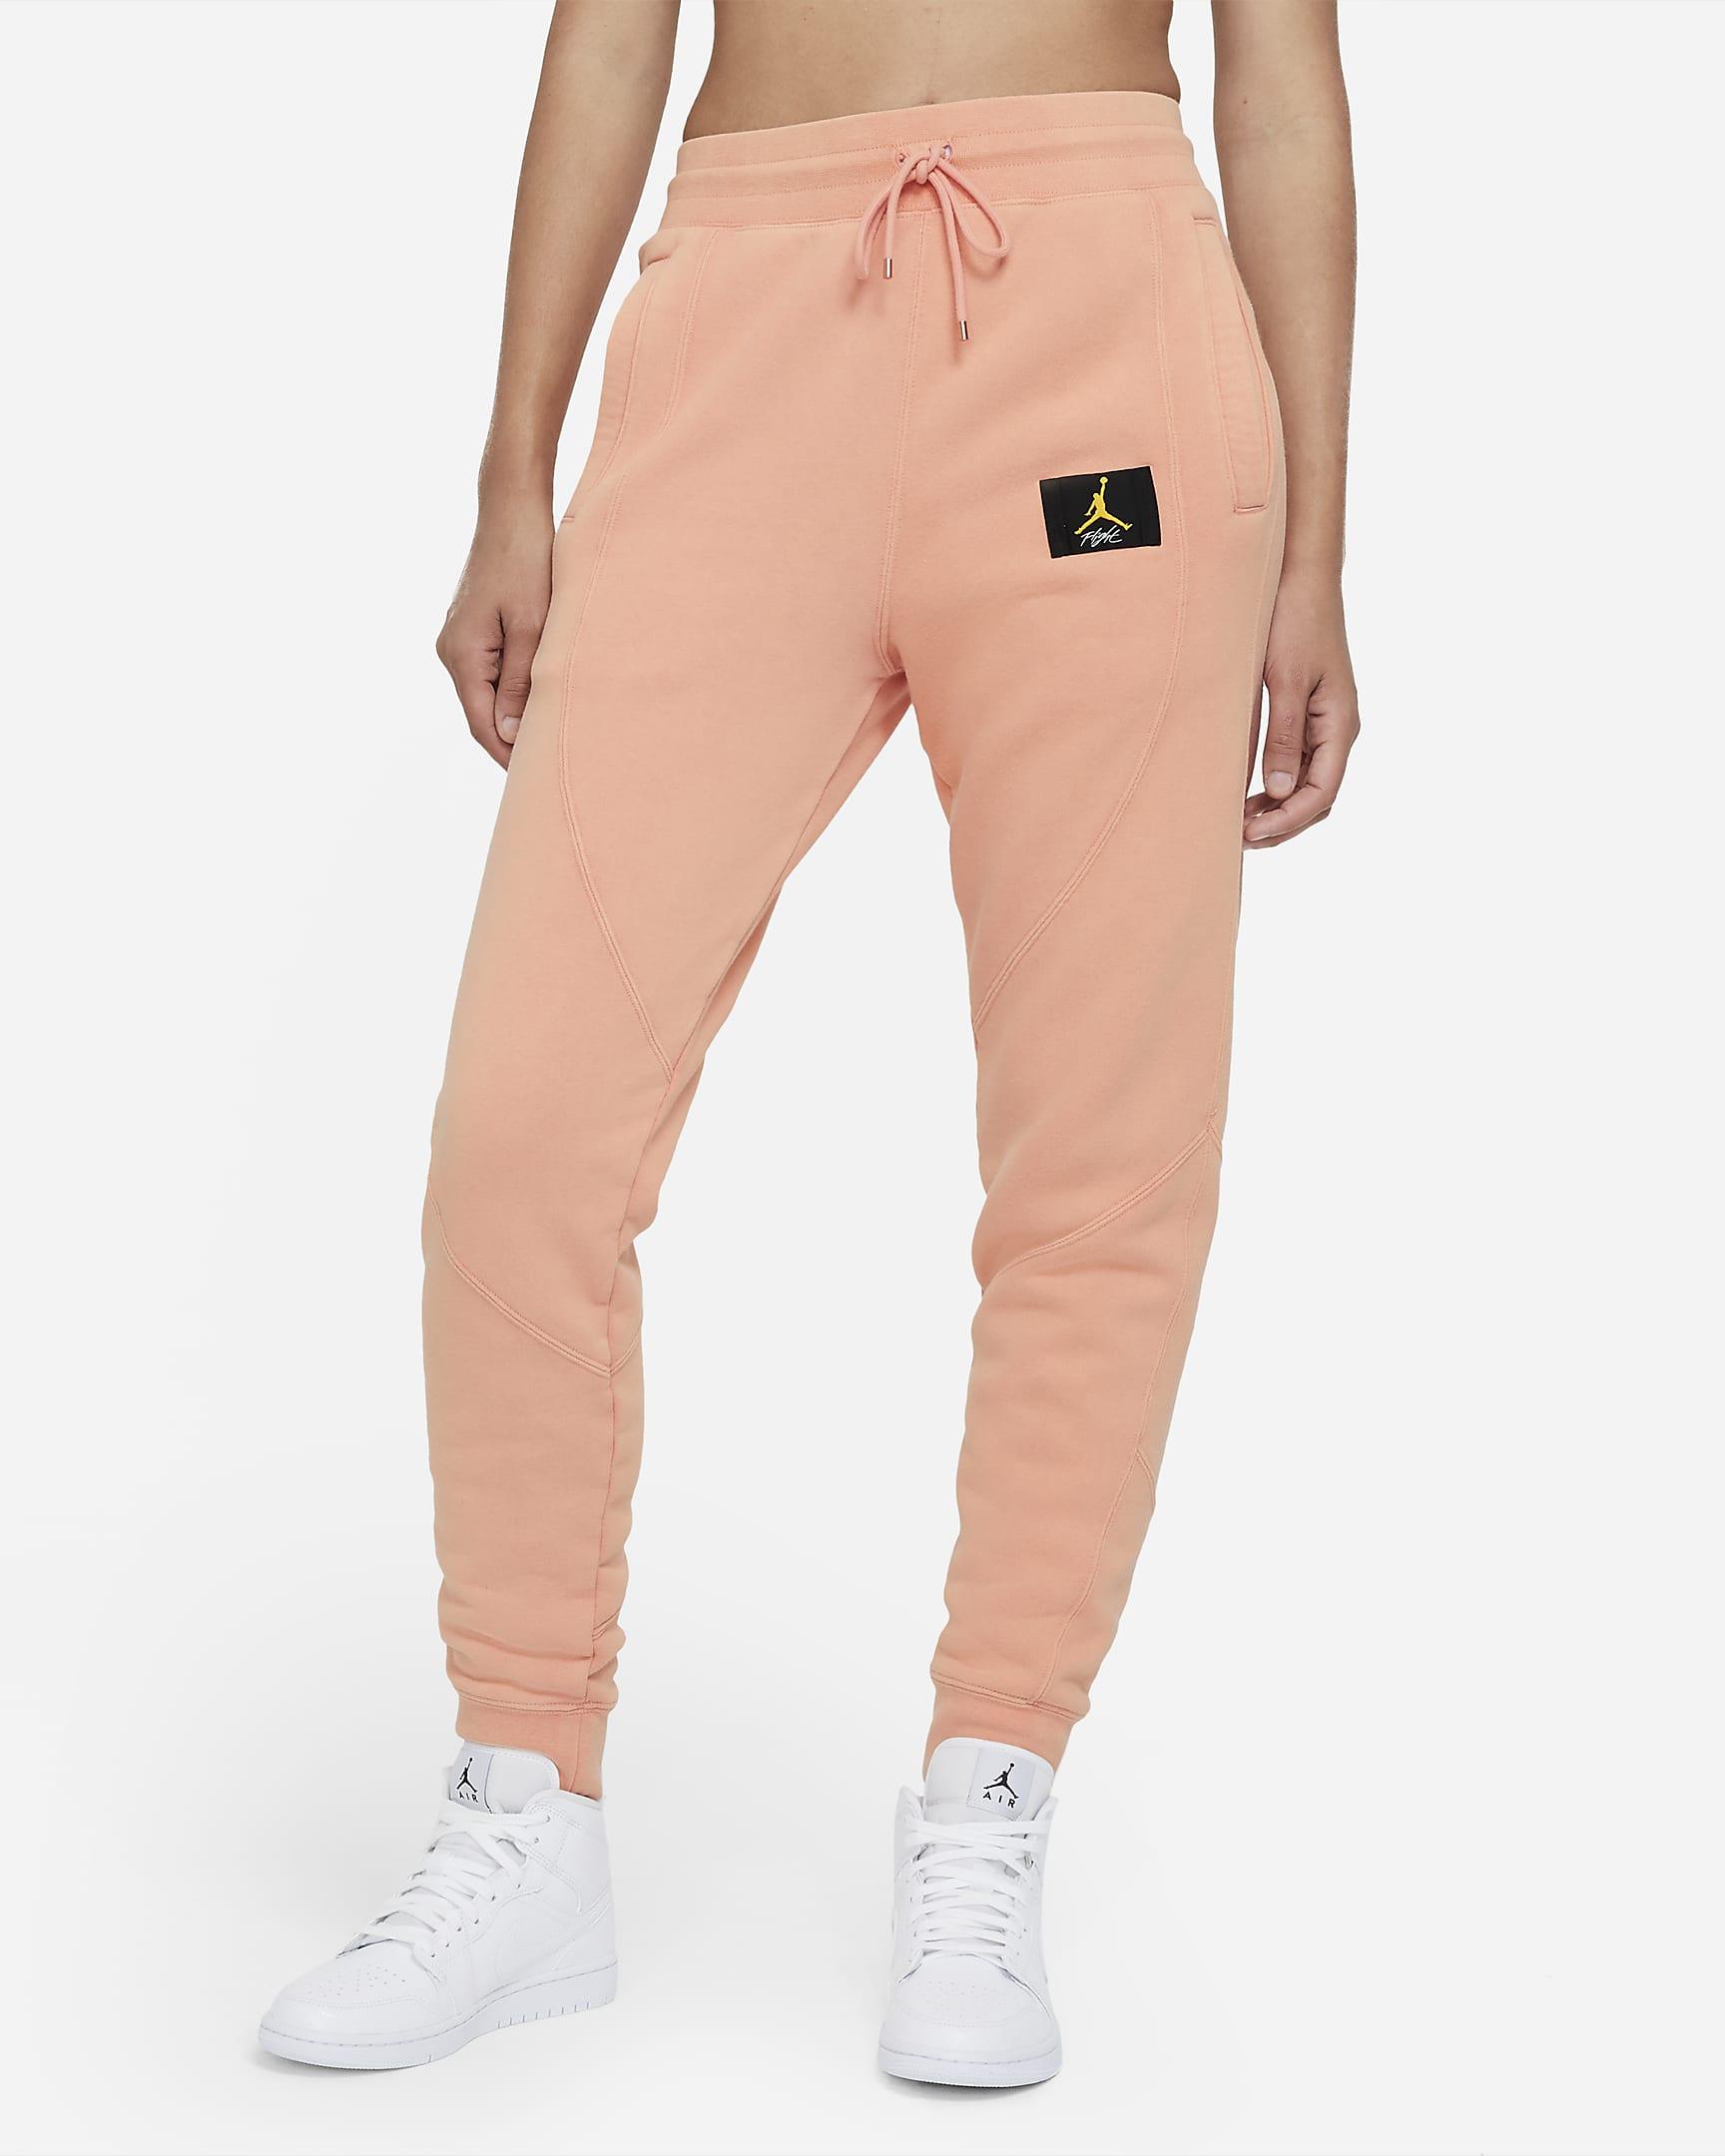 jordan-flight-womens-fleece-pants-0Bl3RW-1